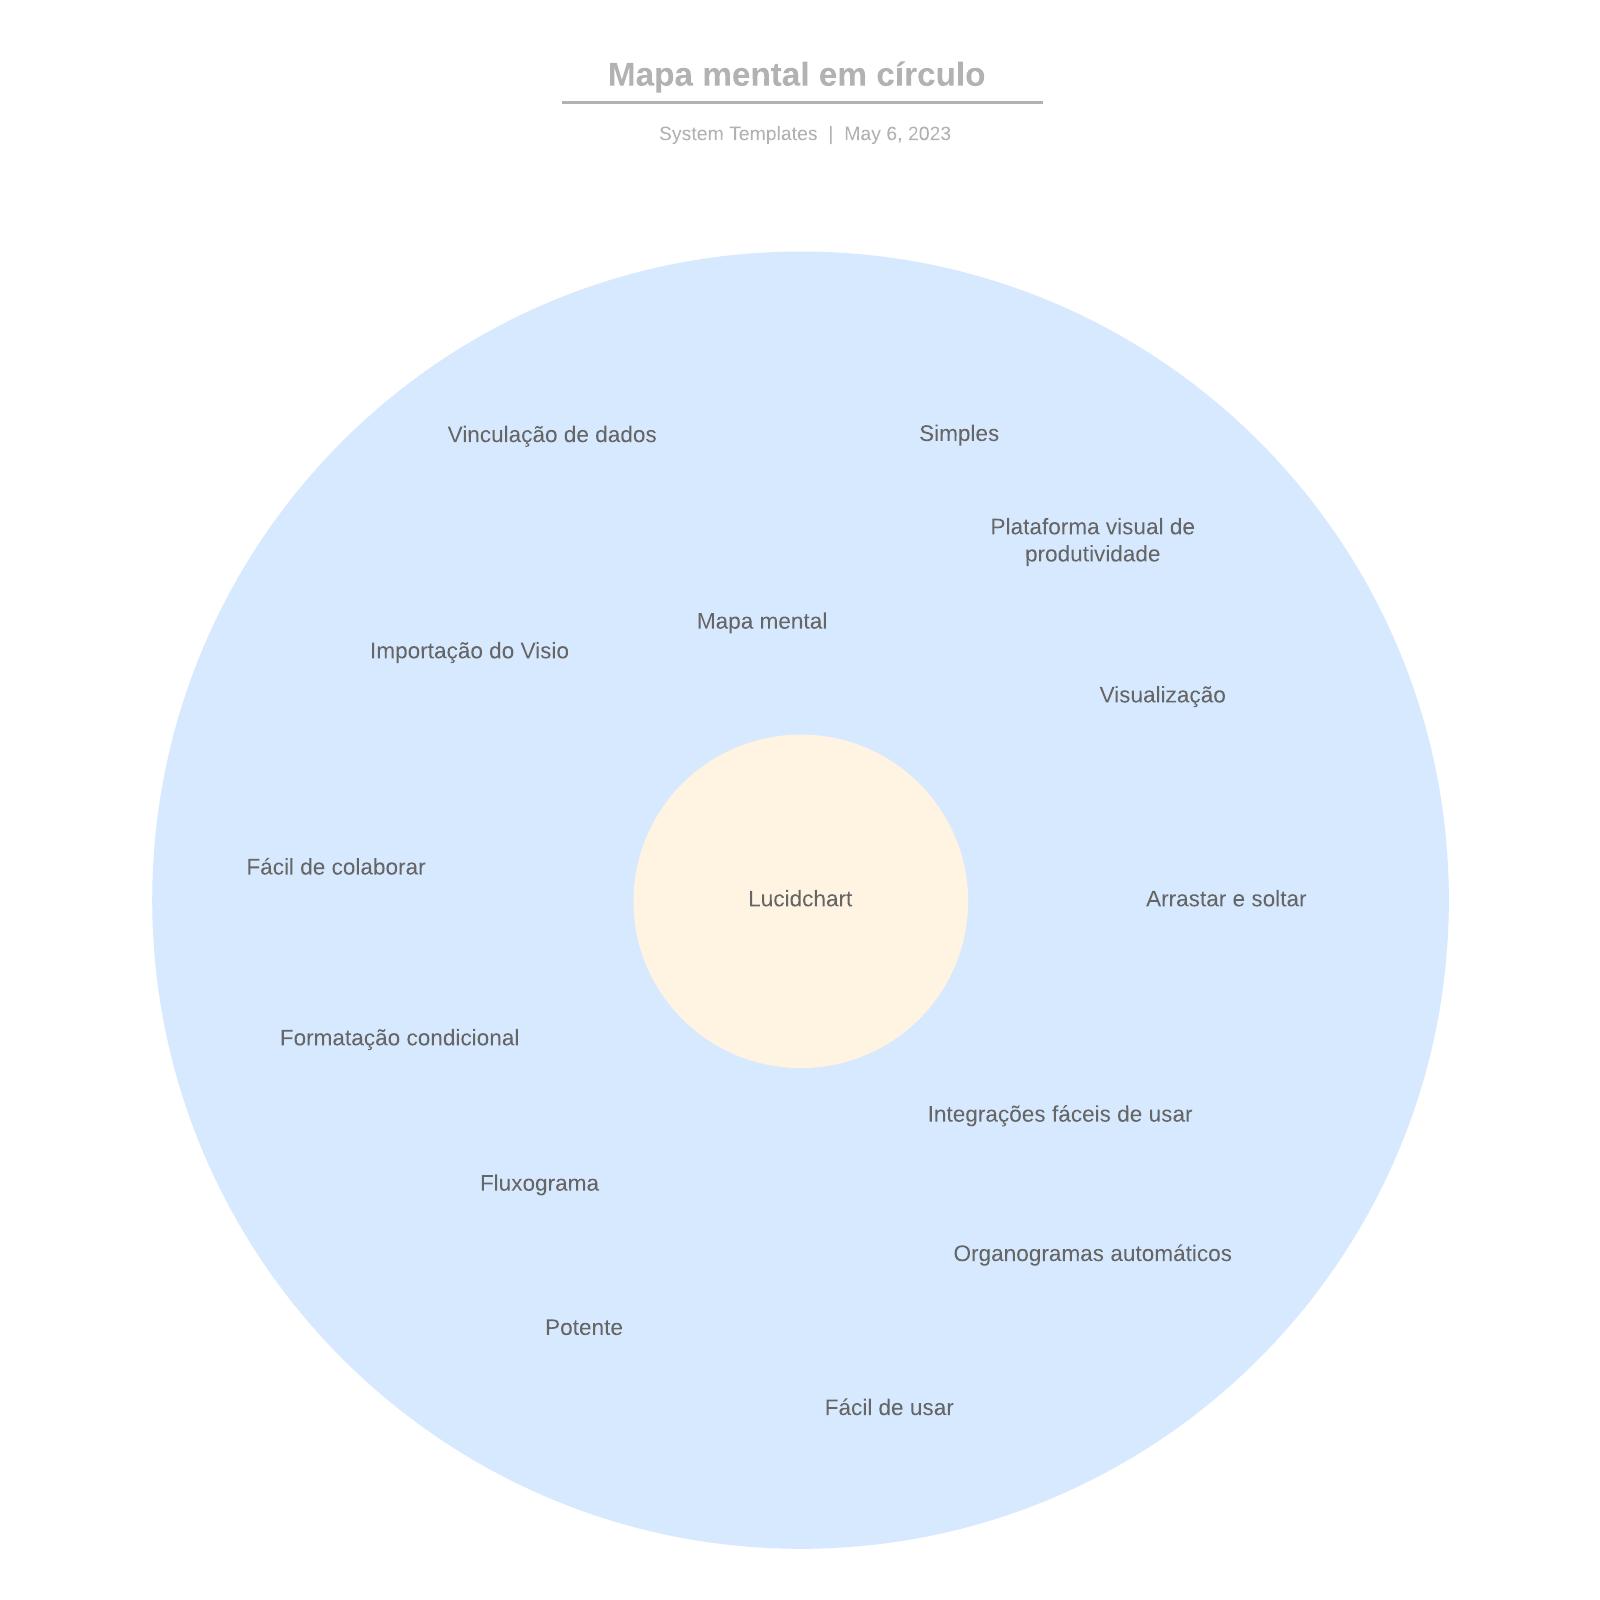 Mapa mental em círculo